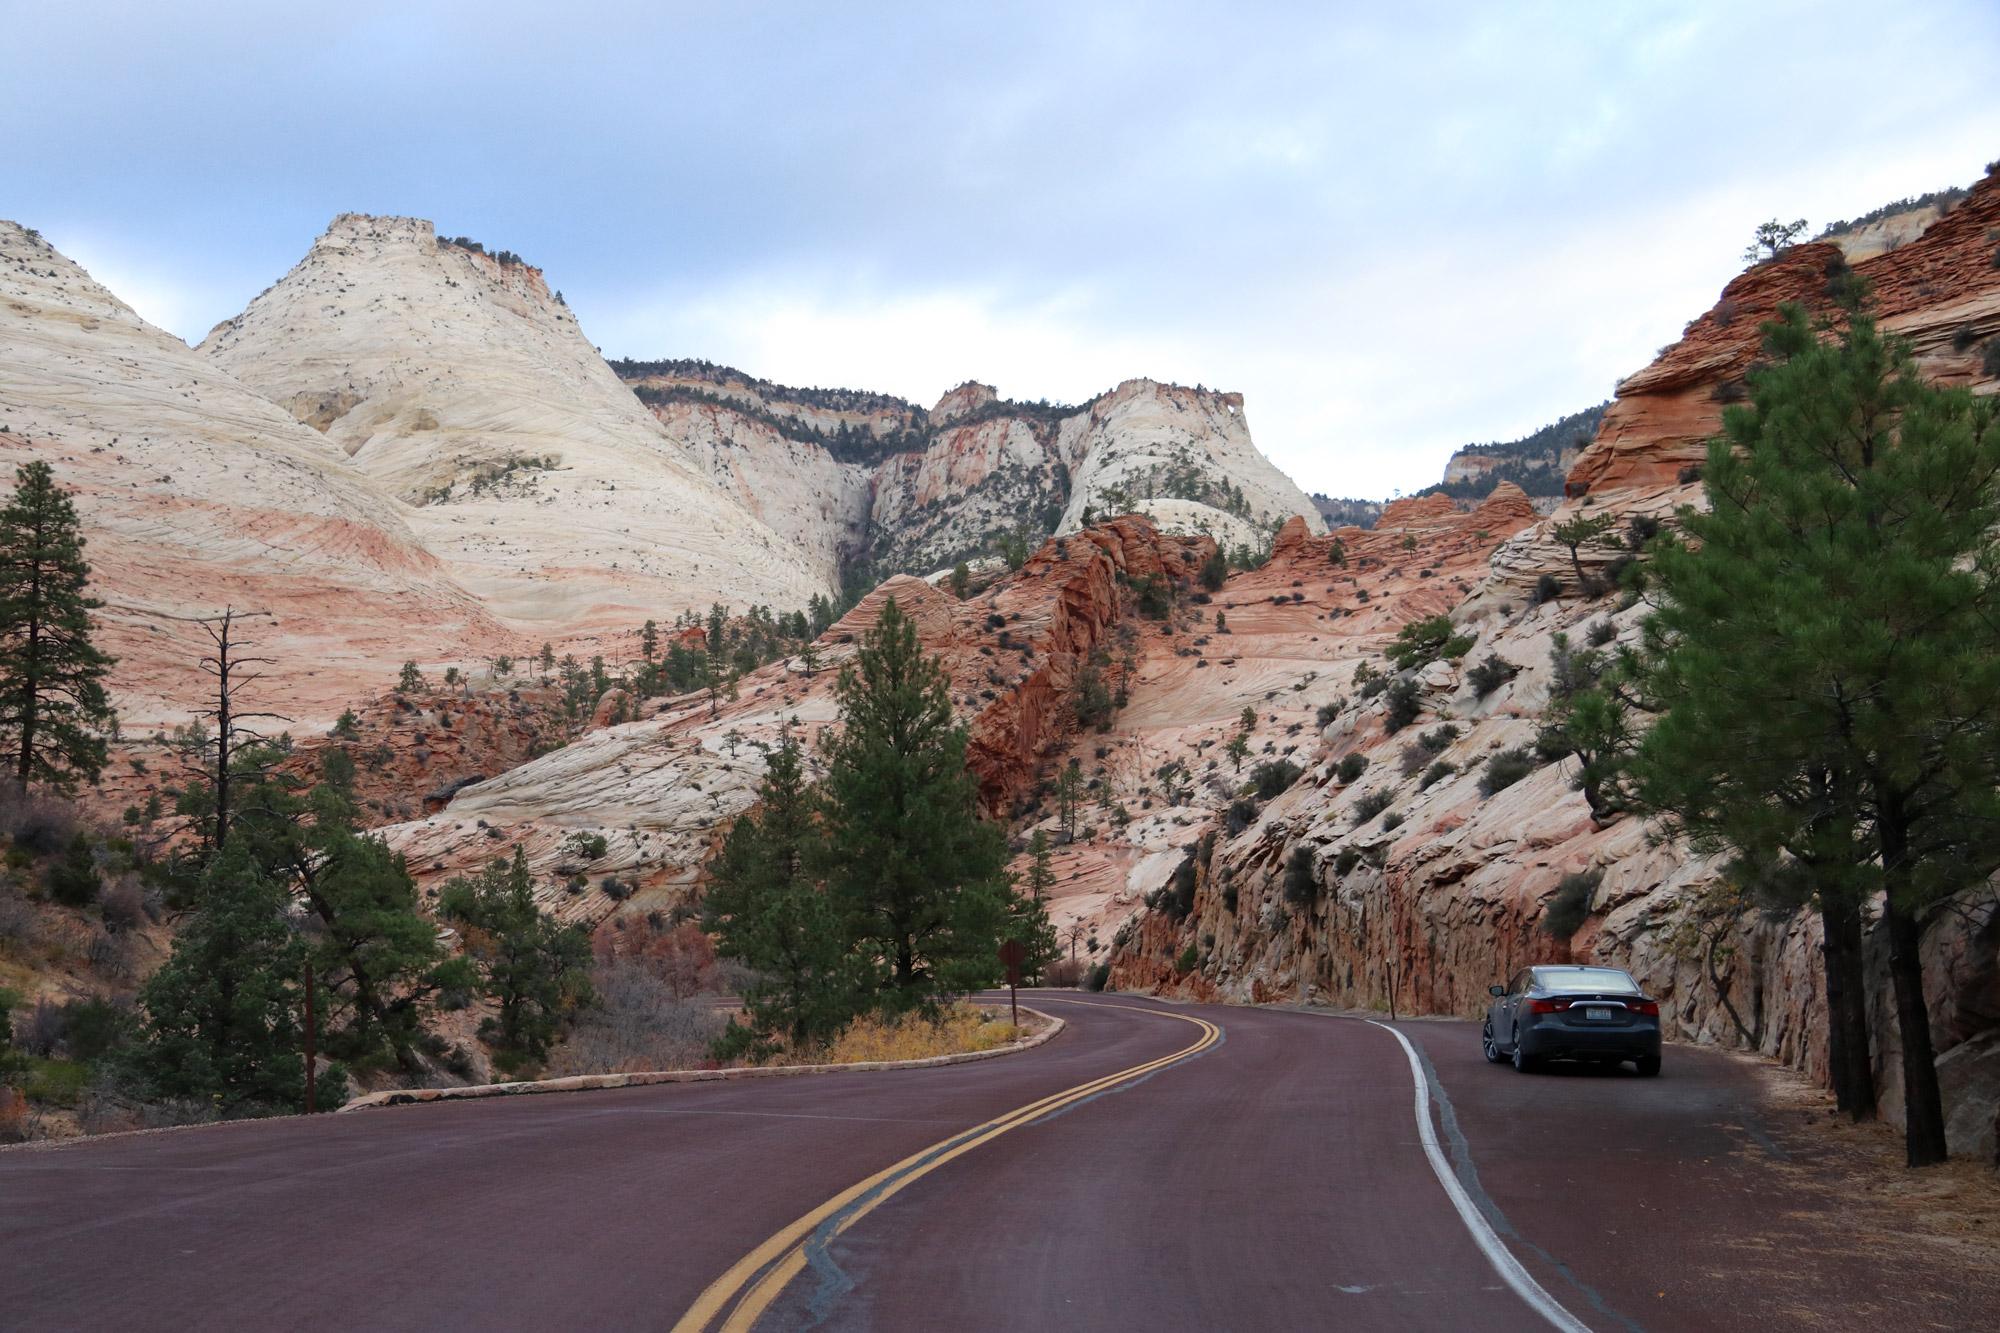 Amerika dag 15 - Zion National Park